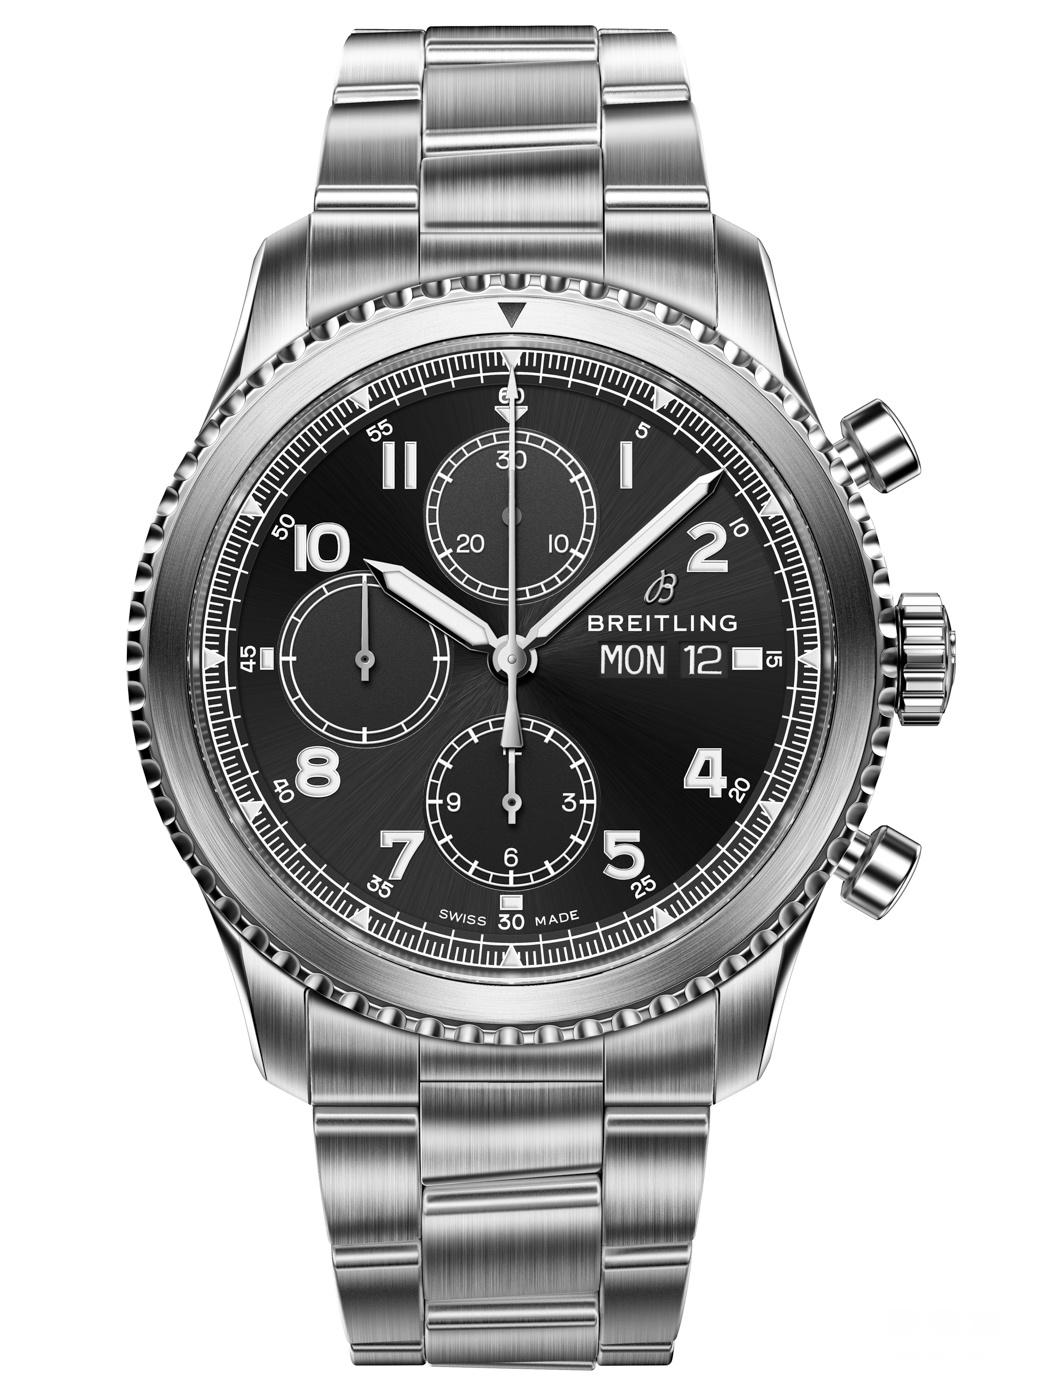 航空计时8计时腕表(Navitimer 8 Chronograph)